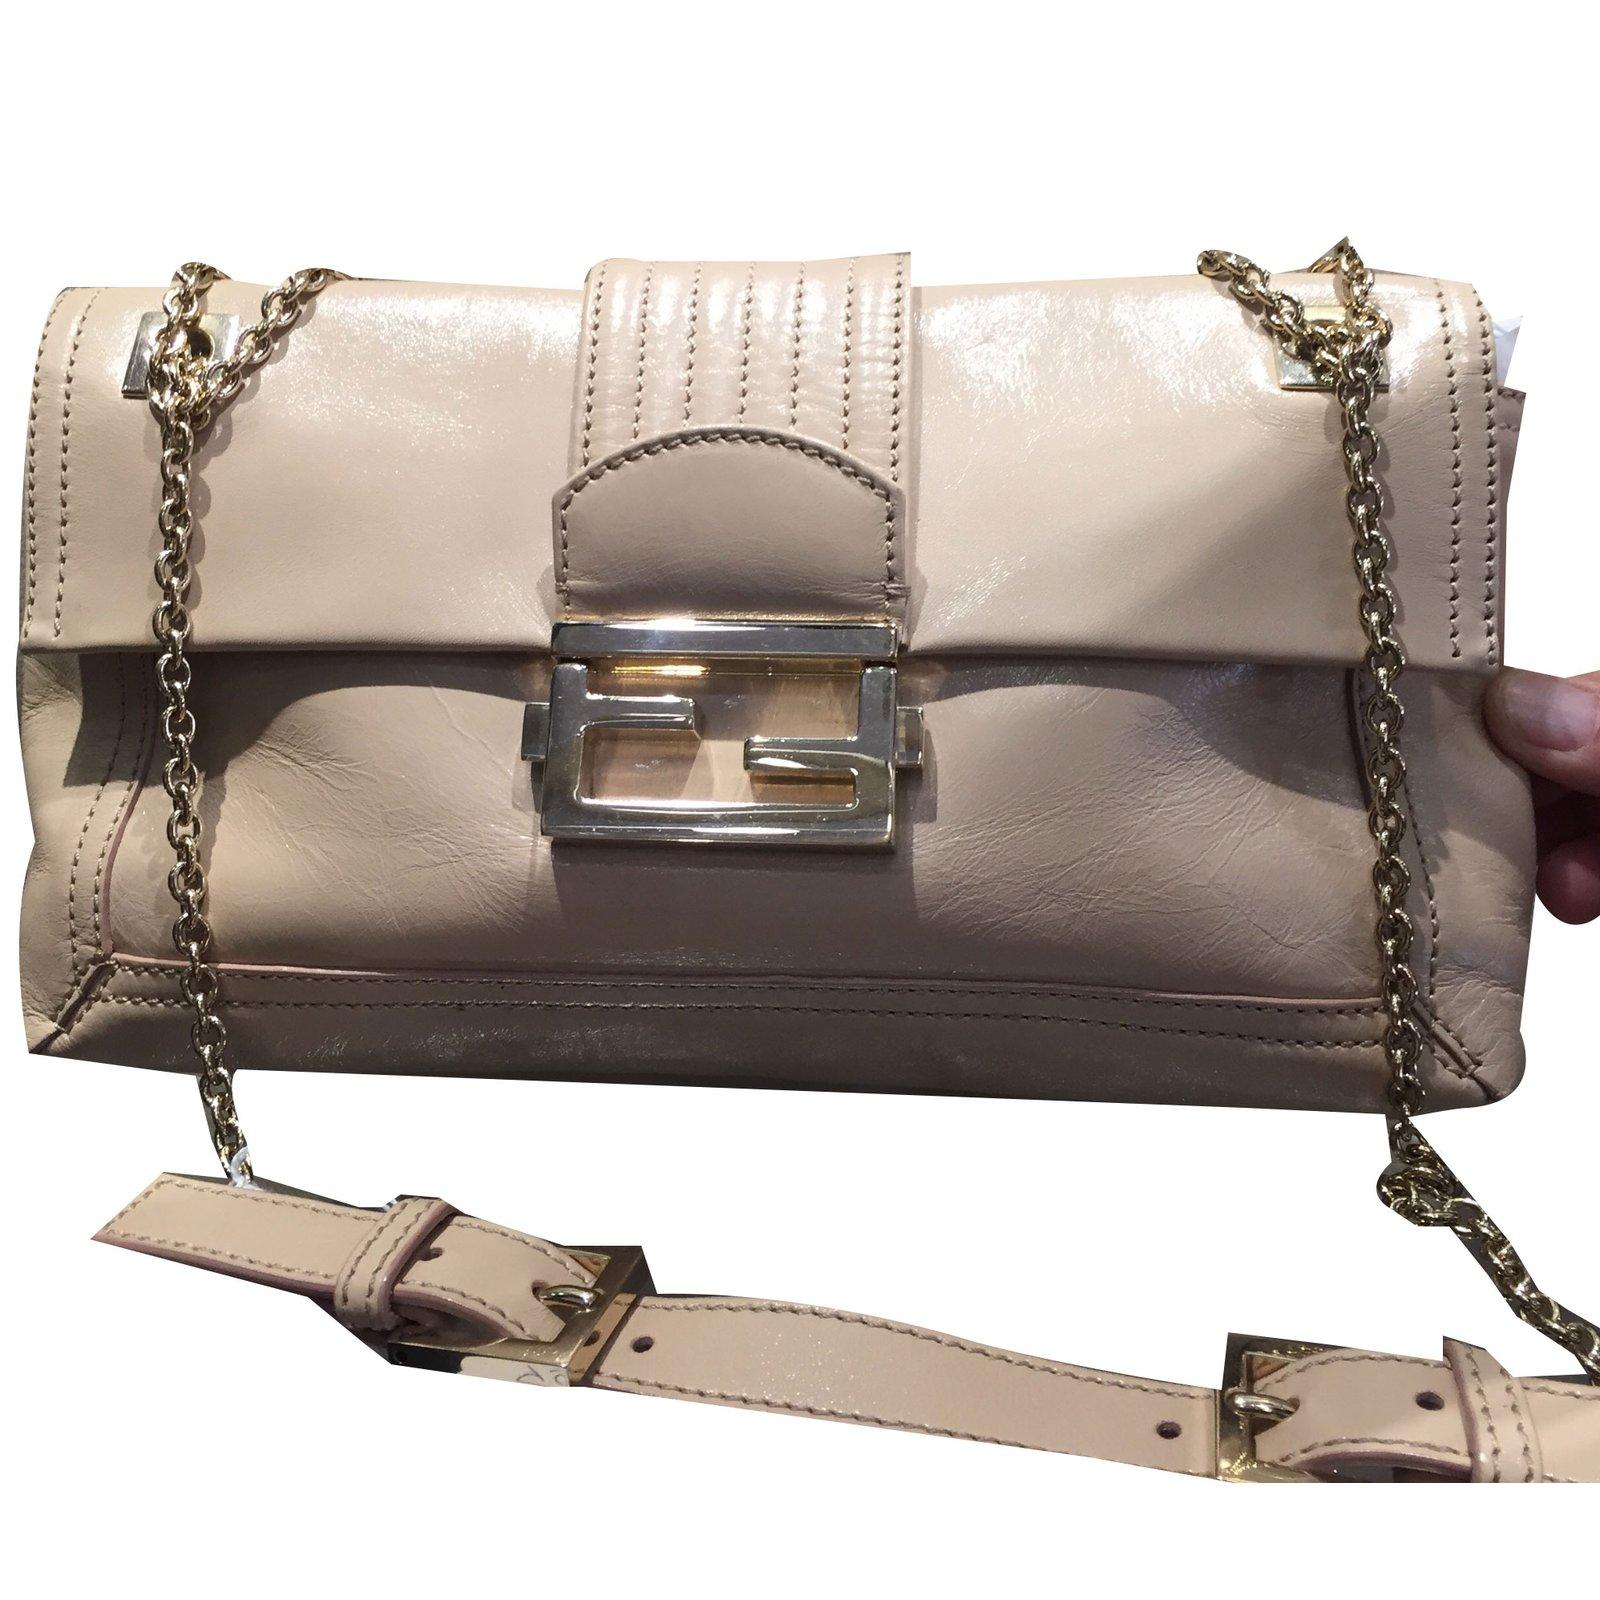 8e7f5db0a4fb Fendi Fendi baguette Handbags Leather Beige ref.80018 - Joli Closet